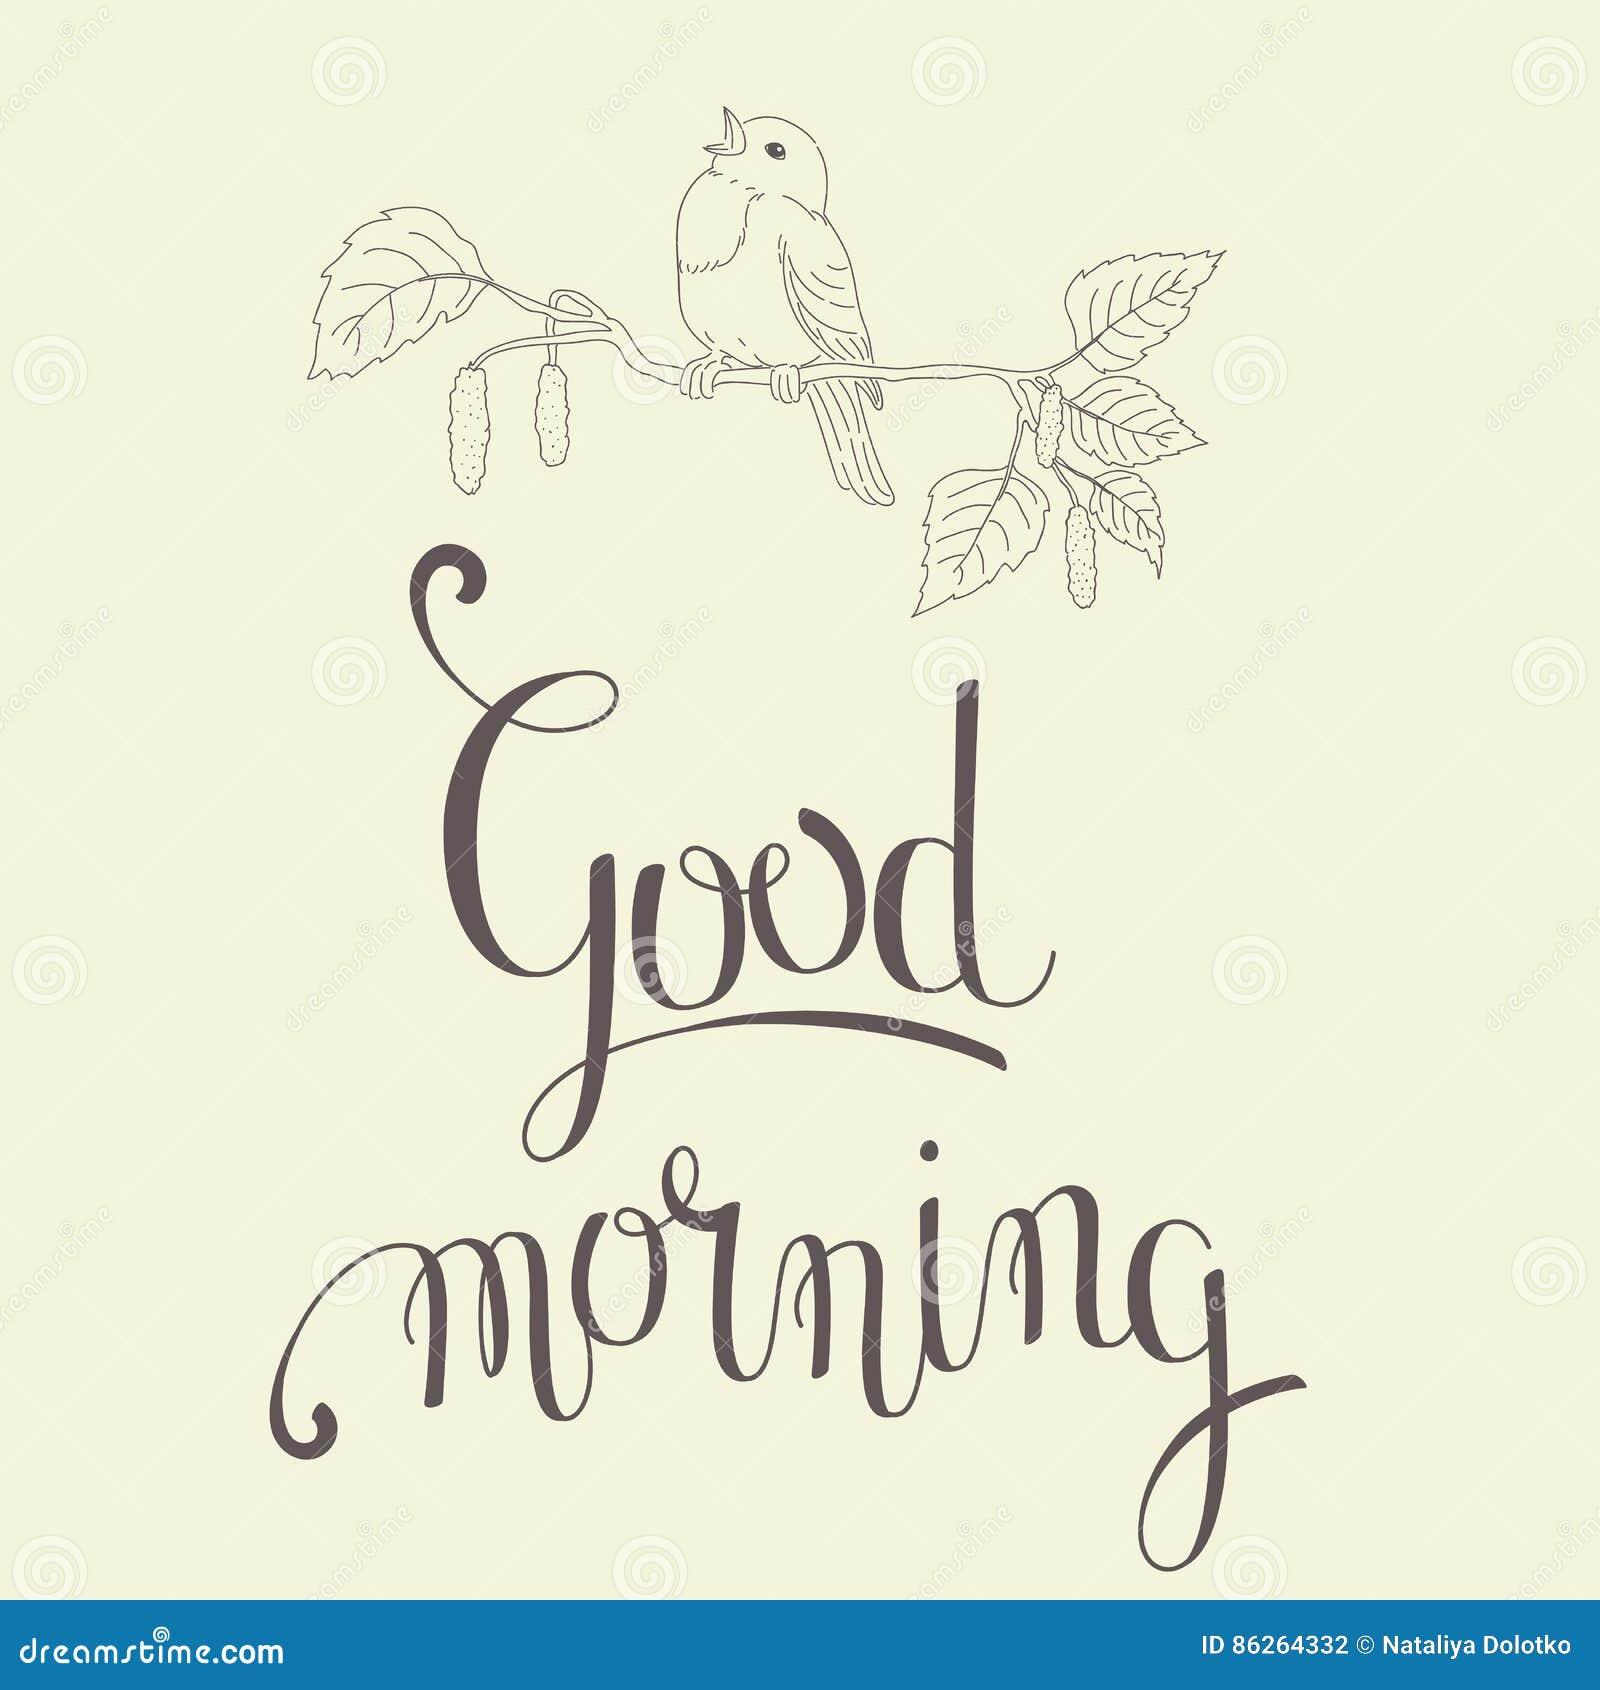 Good Morning Lettering Stock Vector Illustration Of Foliage 86264332